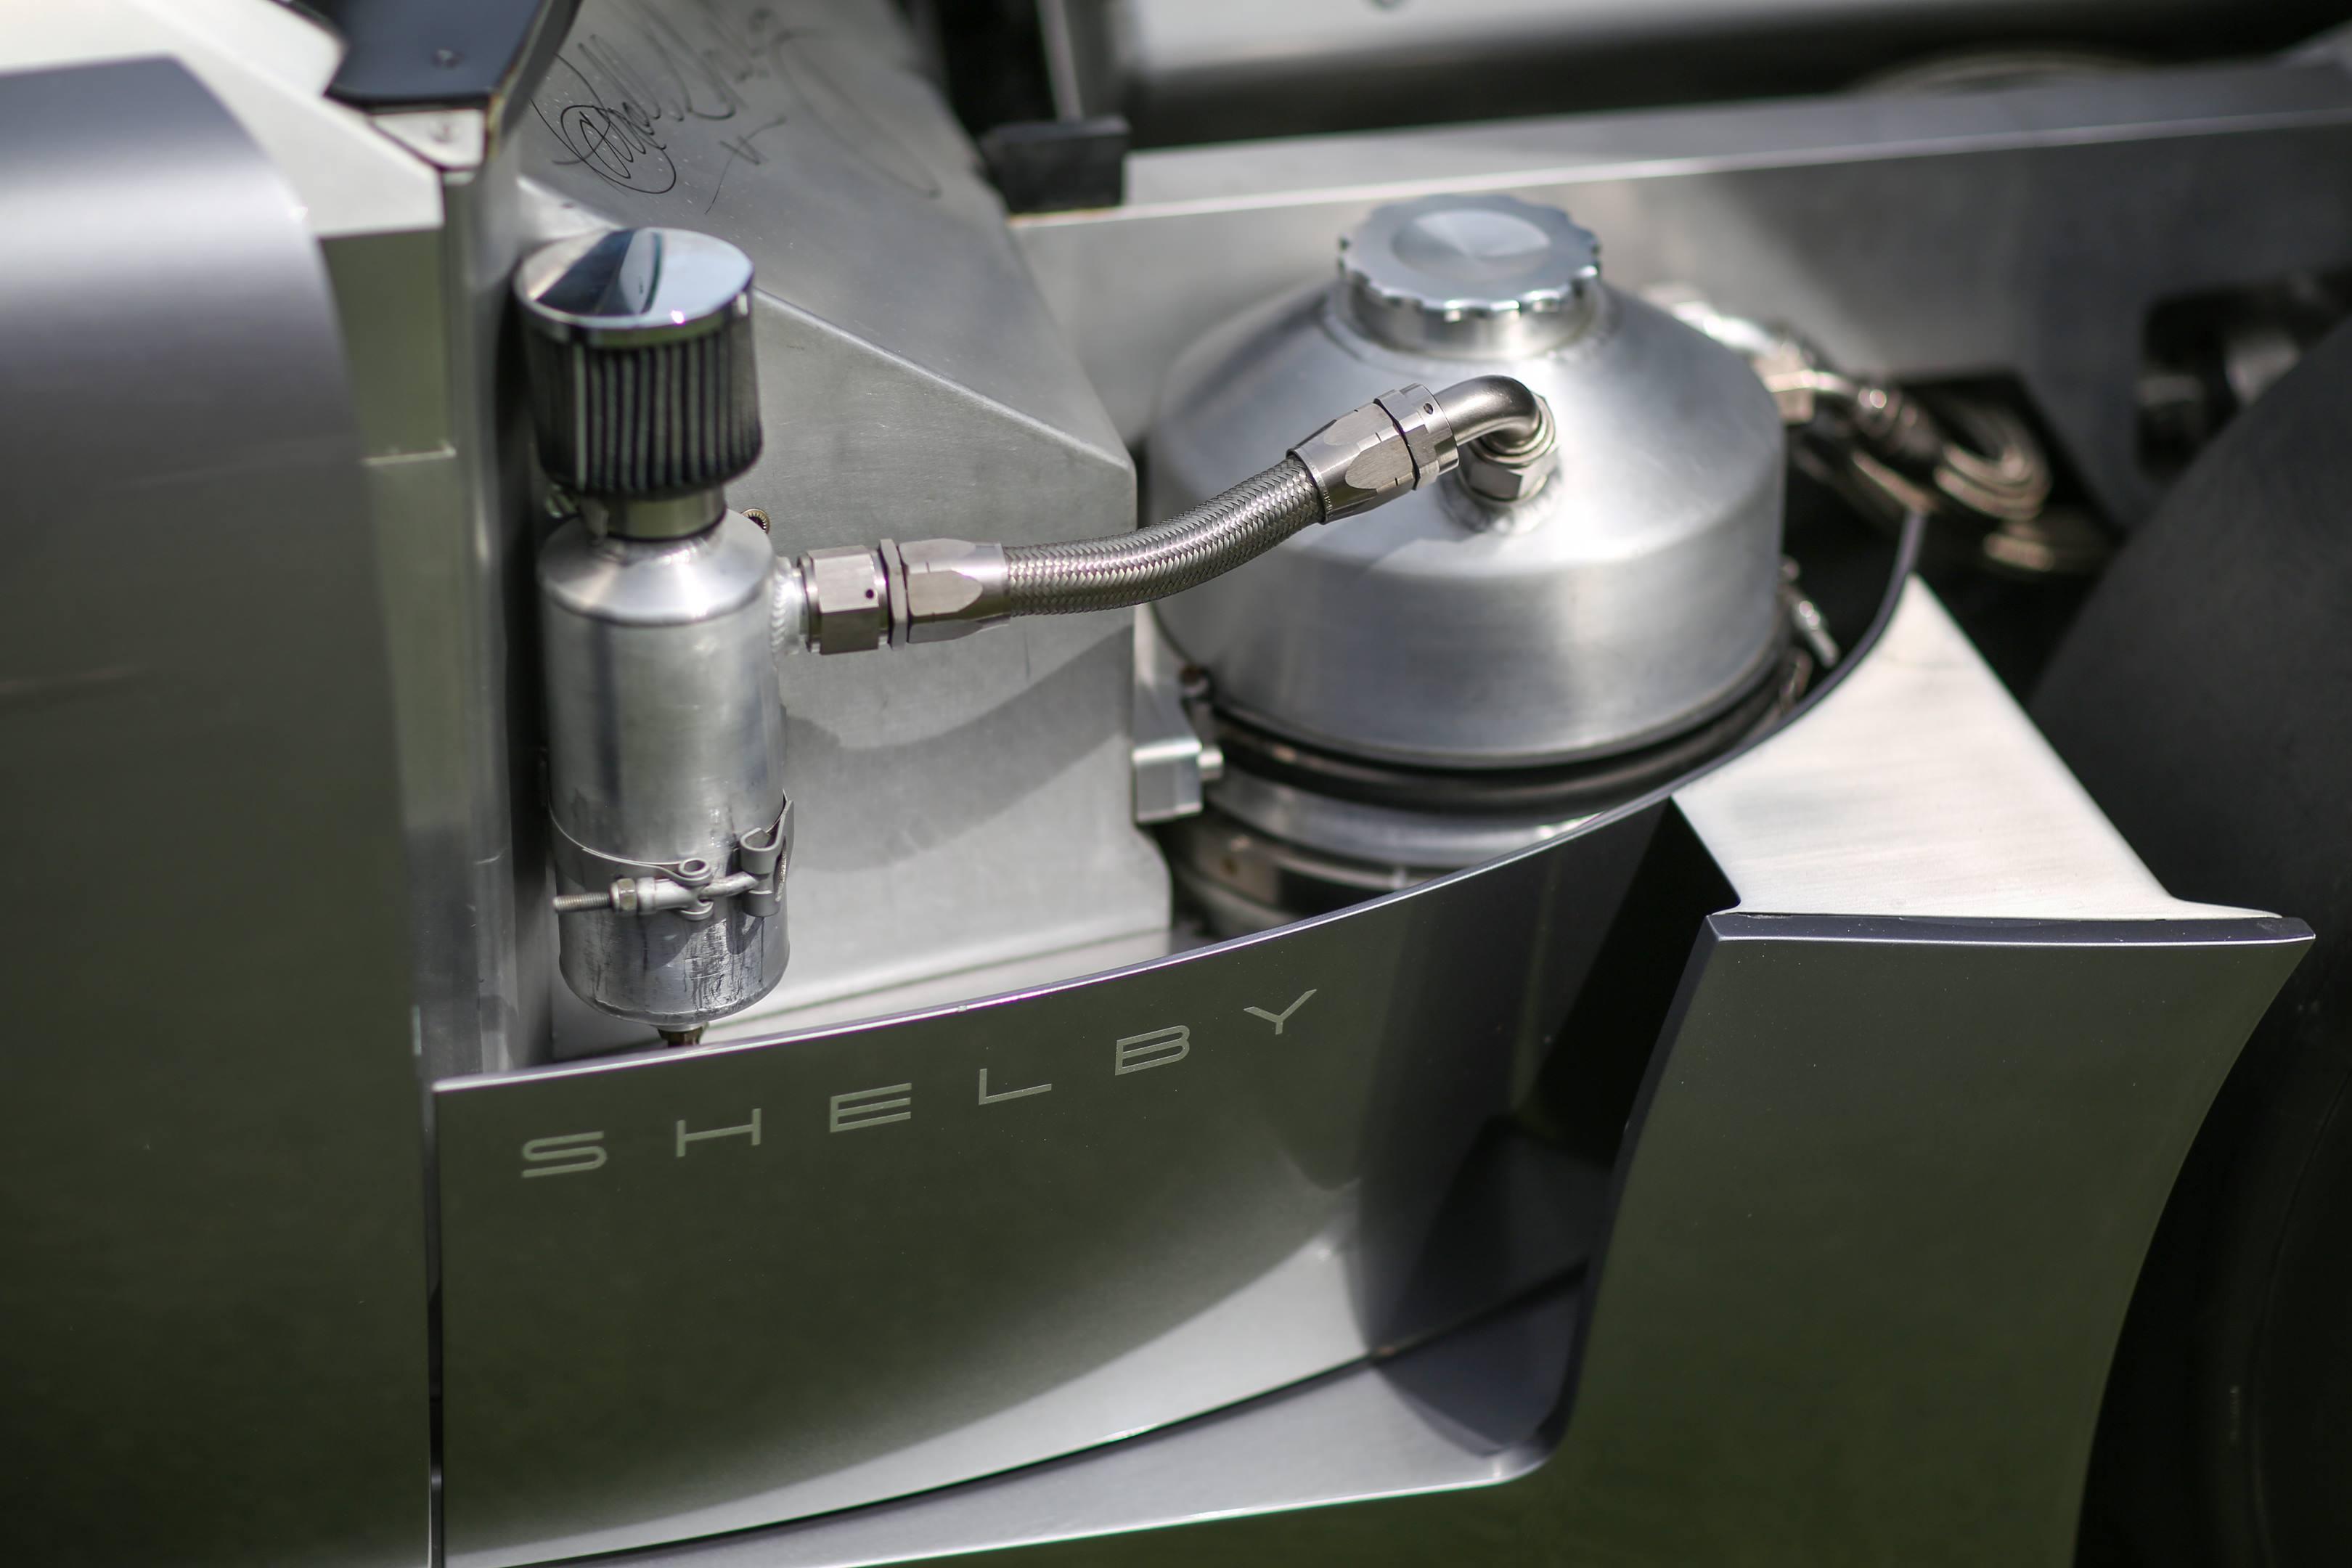 Shelby concept fuel pump